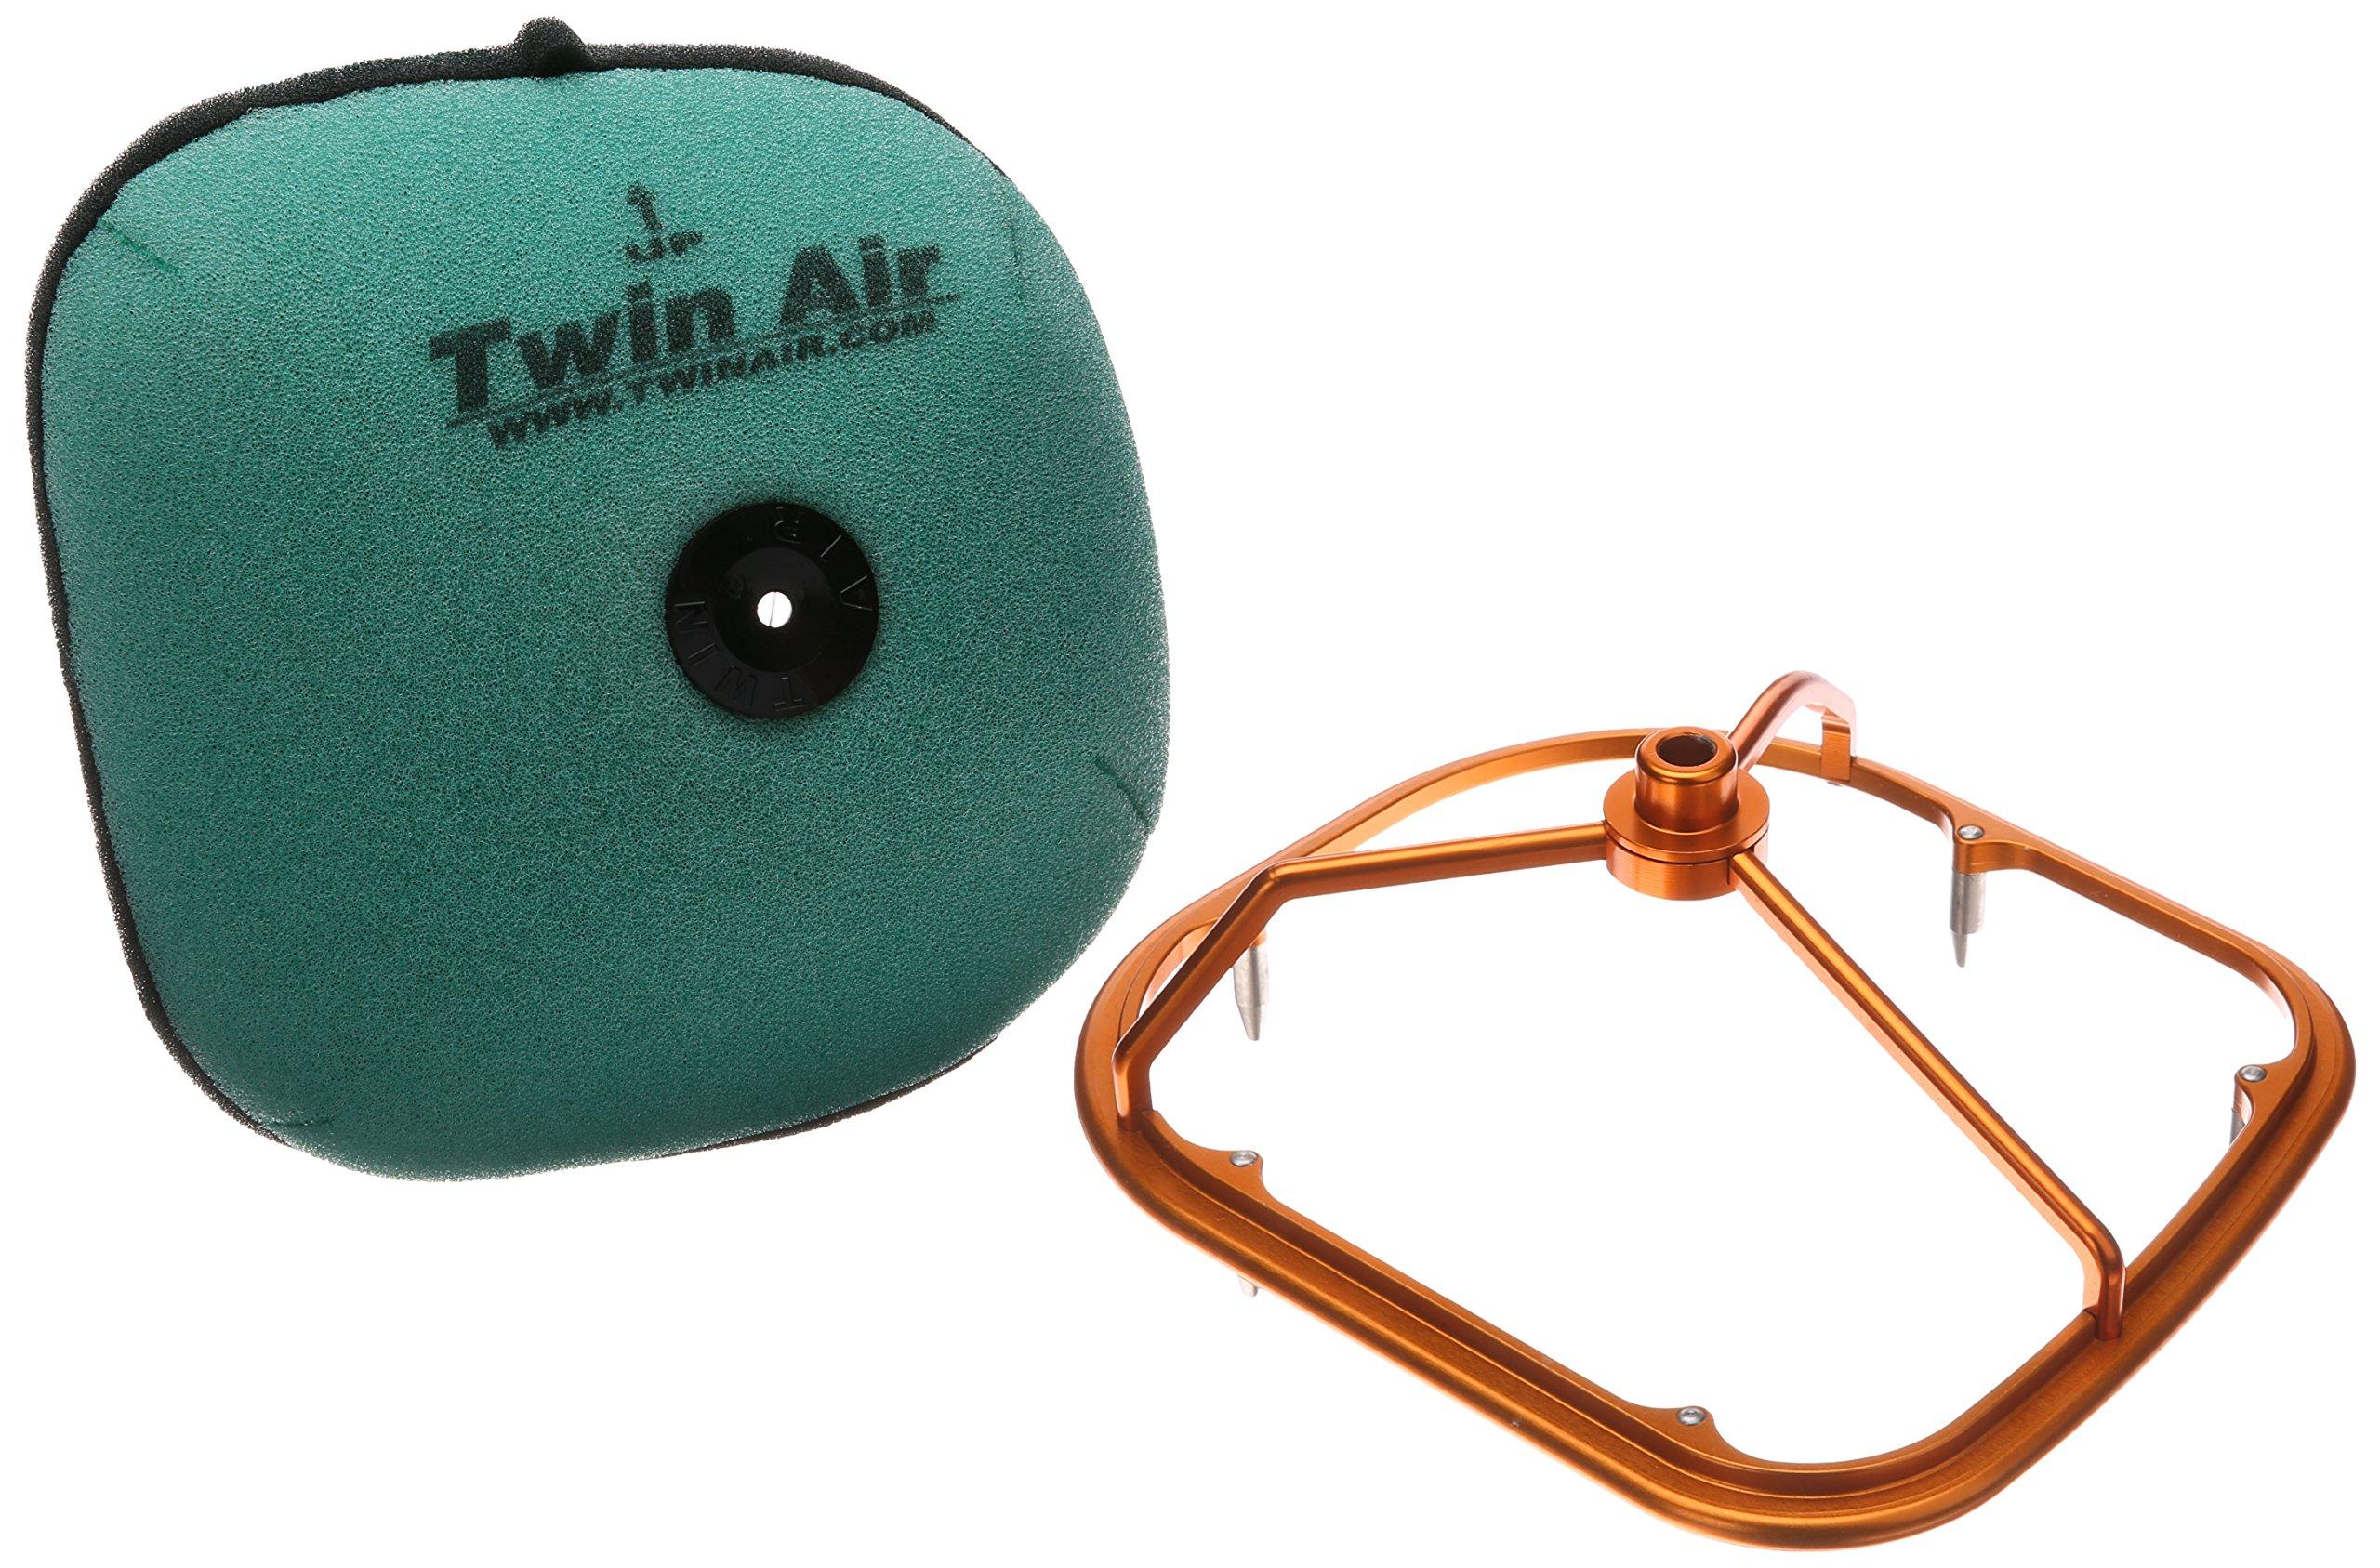 Twin Air 154215c Power Flow Air Filter Kit